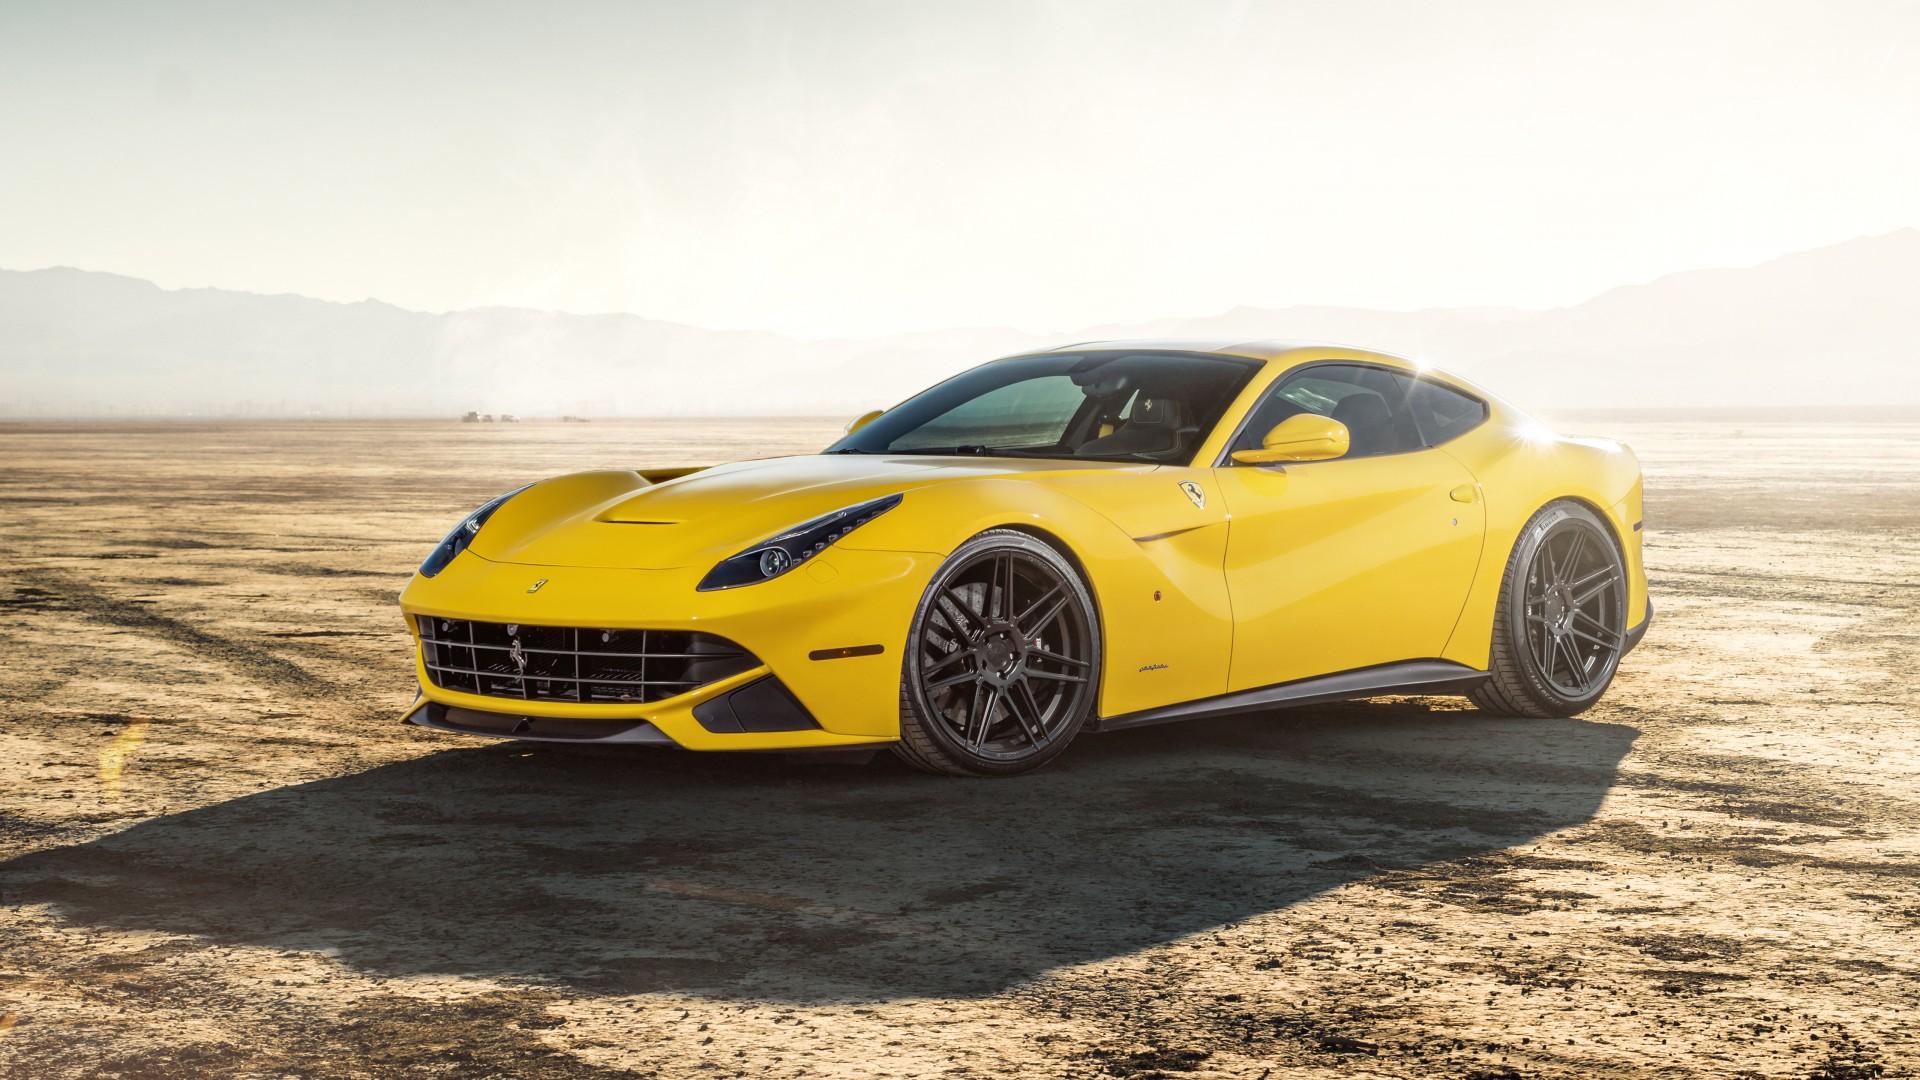 Ferrada Sema Yellow Ferrari F12 5K 2 Wallpaper | HD Car ...